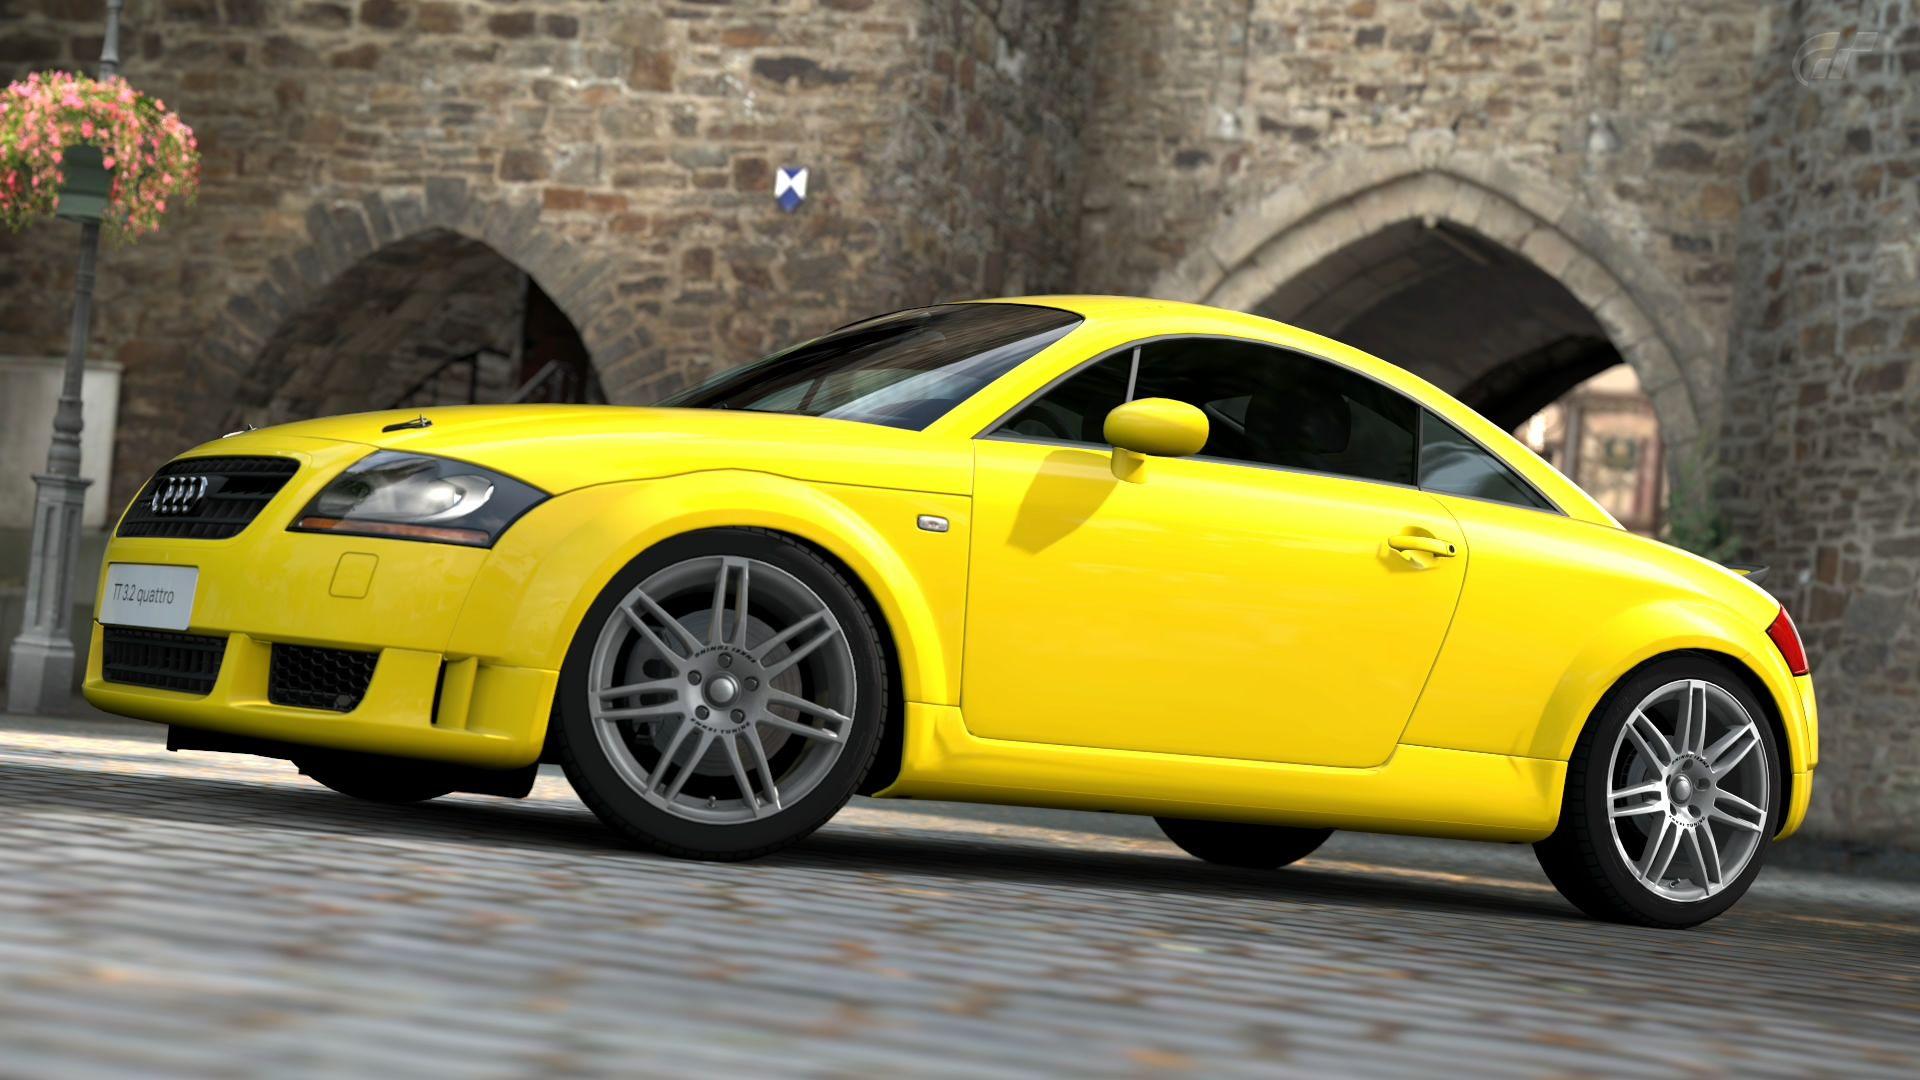 Kelebihan Audi Tt 3.2 Quattro Murah Berkualitas